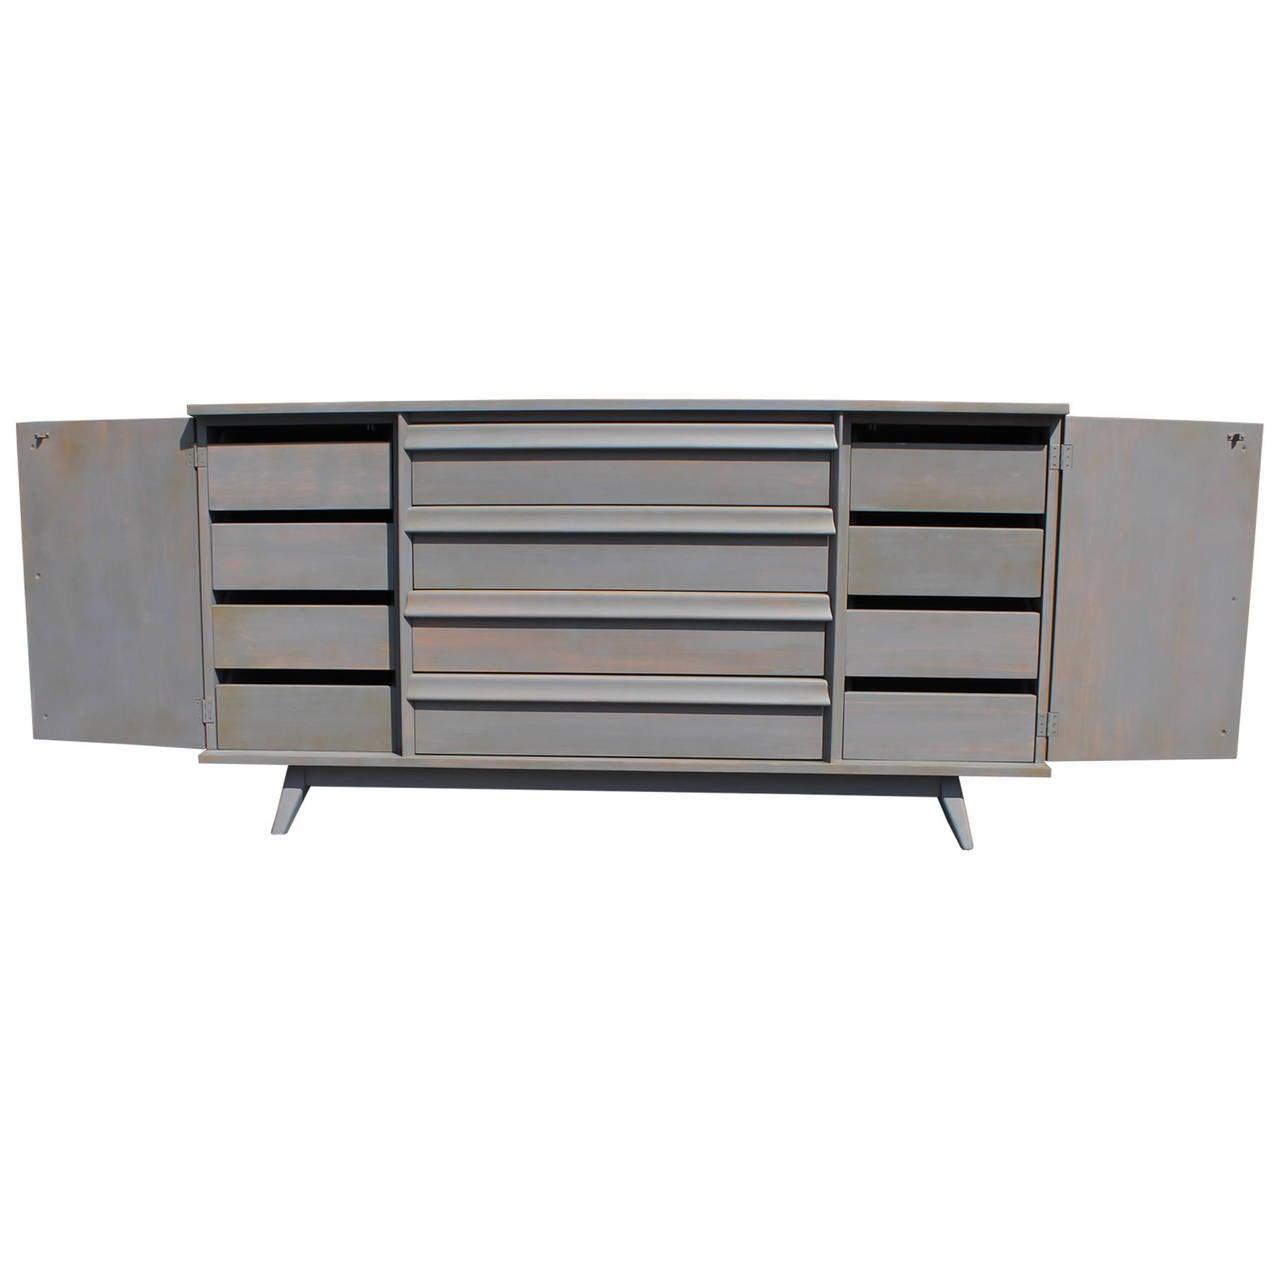 excellent grey washed modern twelvedrawer dresser at stdibs - excellent grey washed modern twelvedrawer dresser